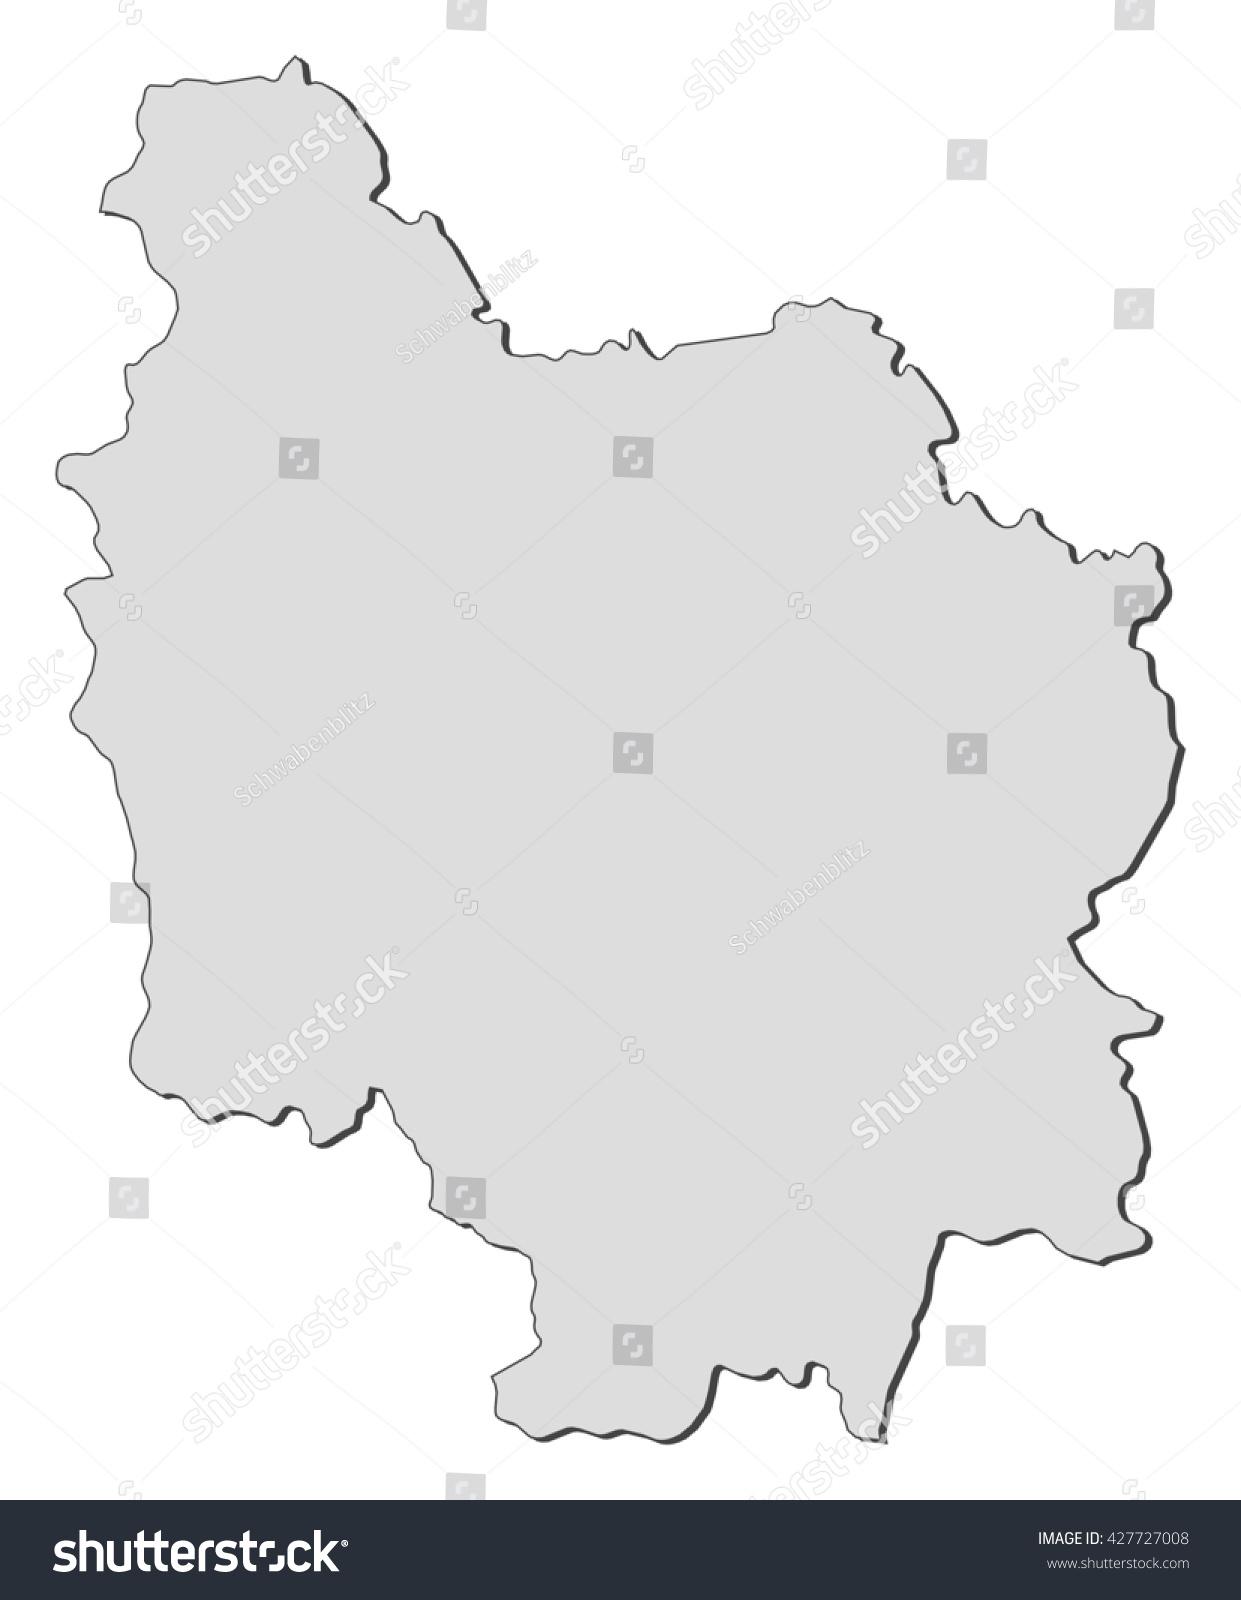 Map Burgundy France Stock Vector Royalty Free 427727008 Shutterstock